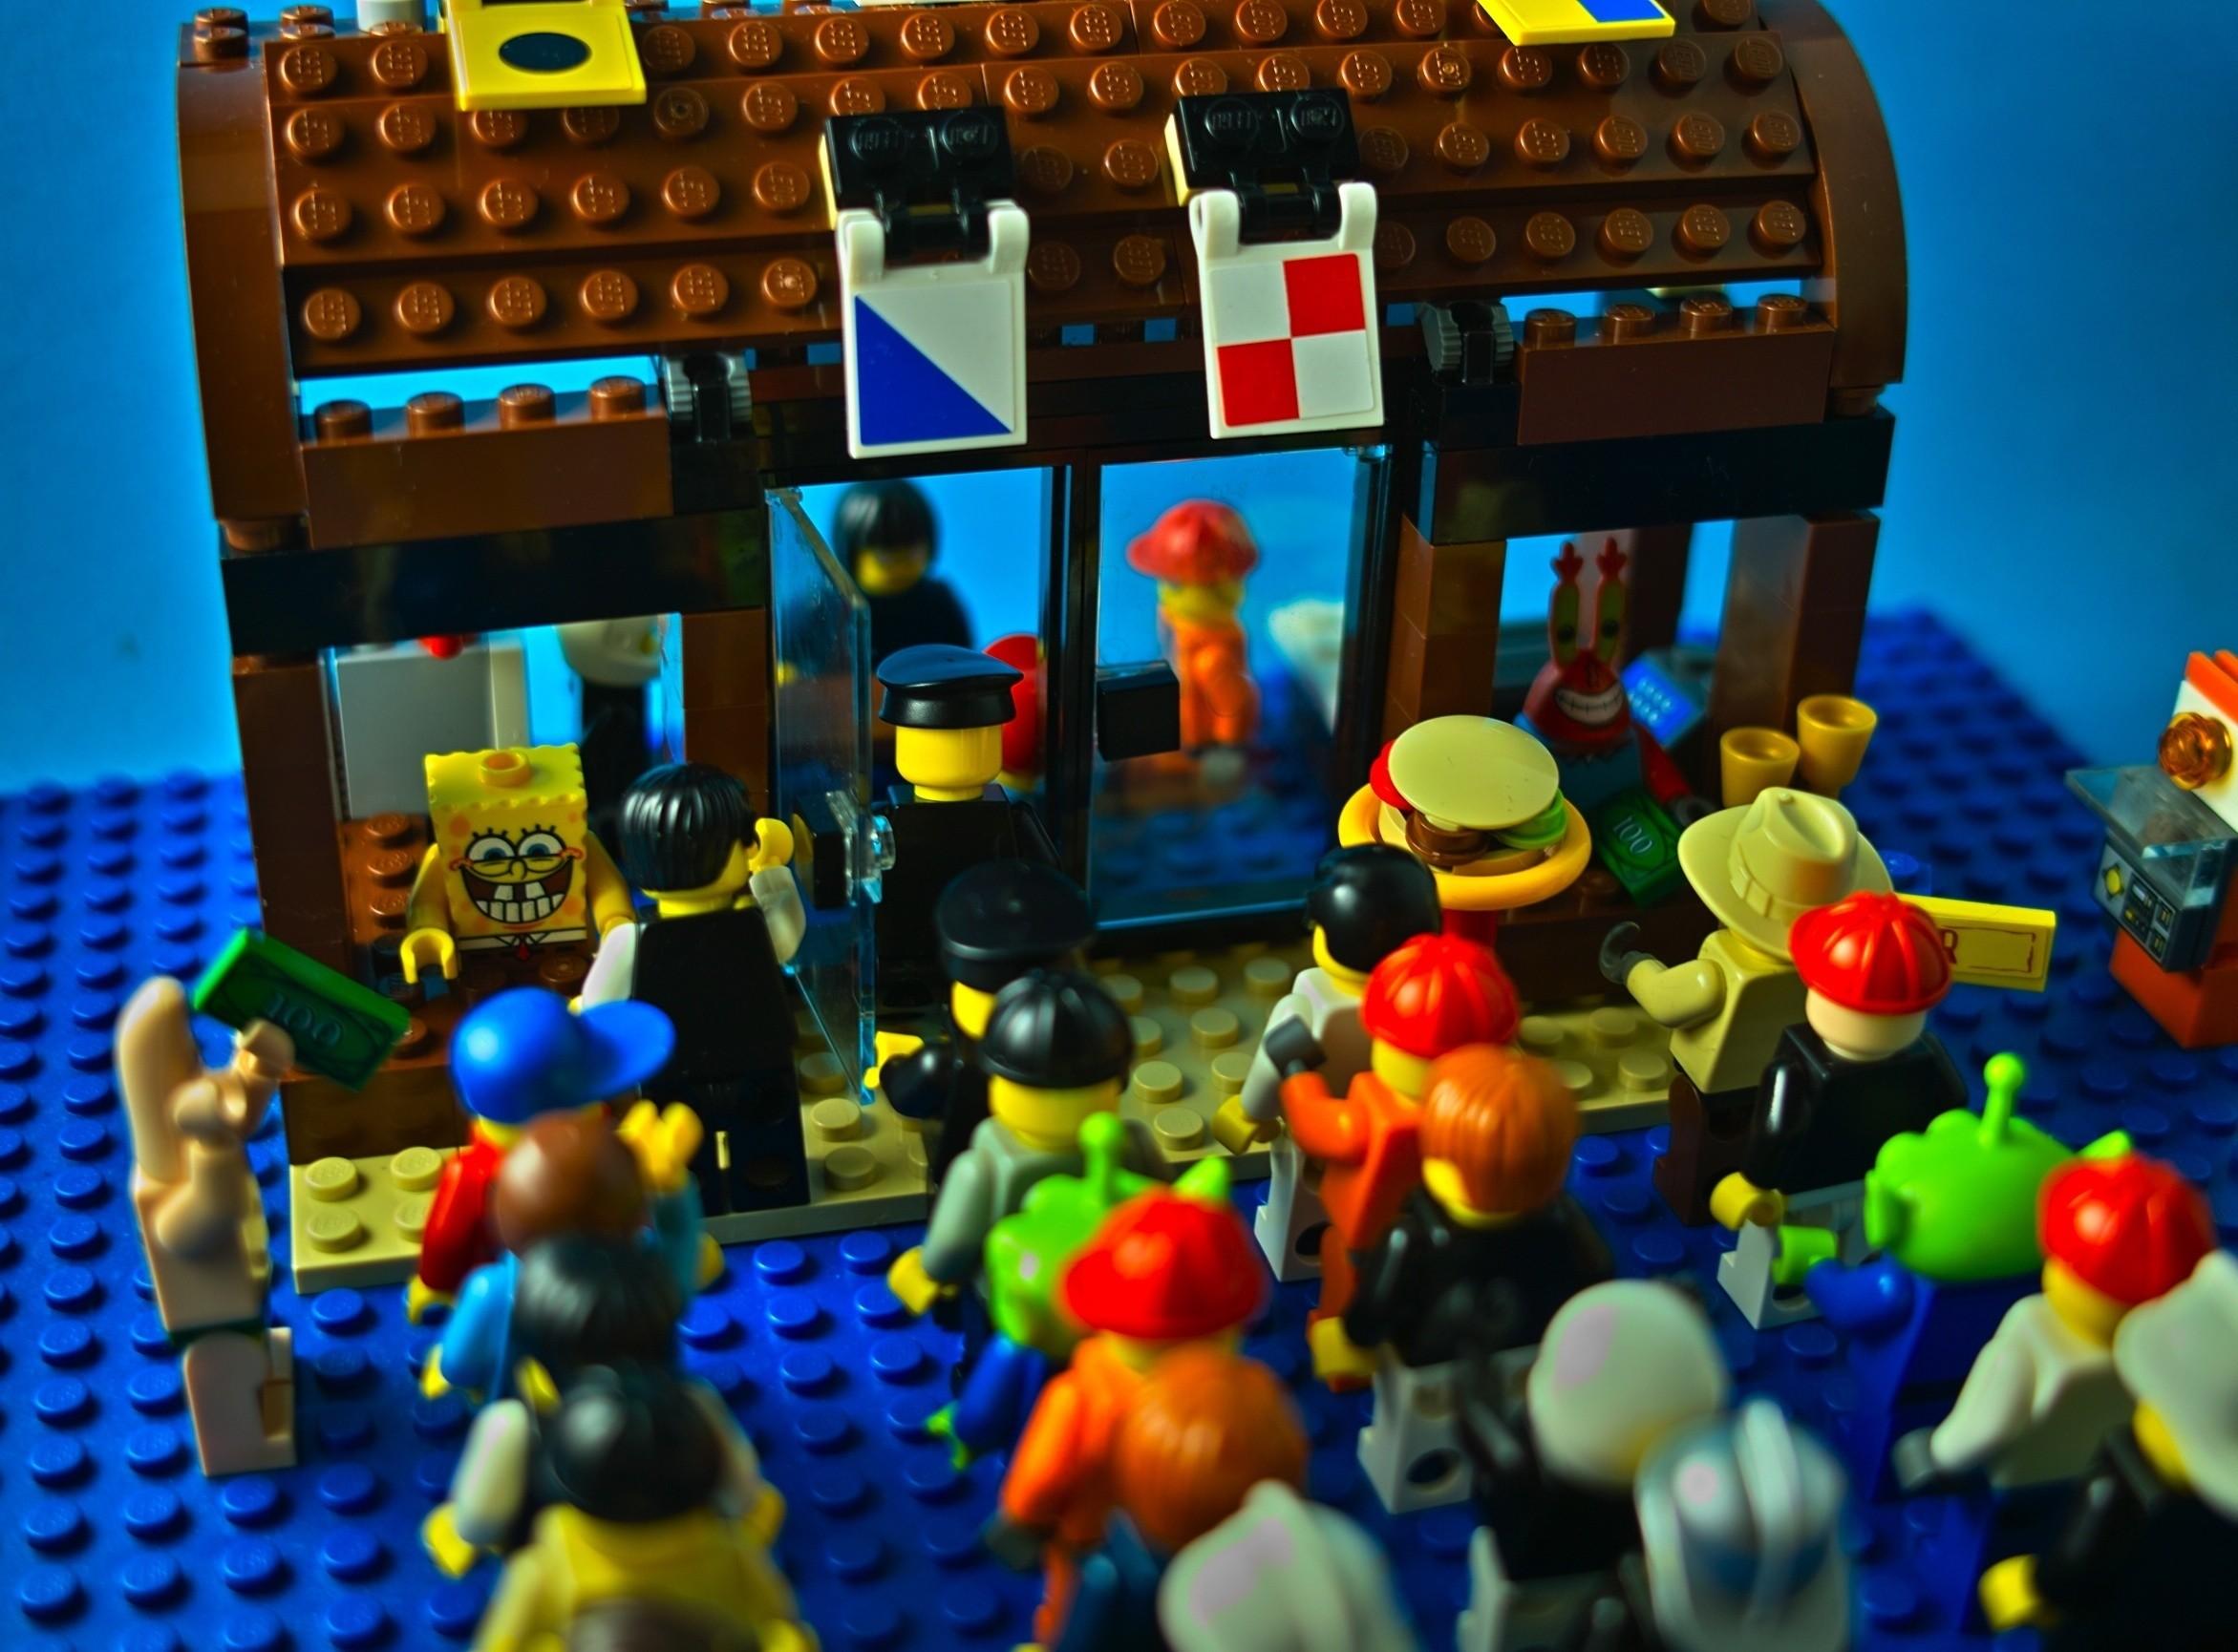 Lego SpongeBob Squarepants images LEGO SB SP HD wallpaper and background  photos